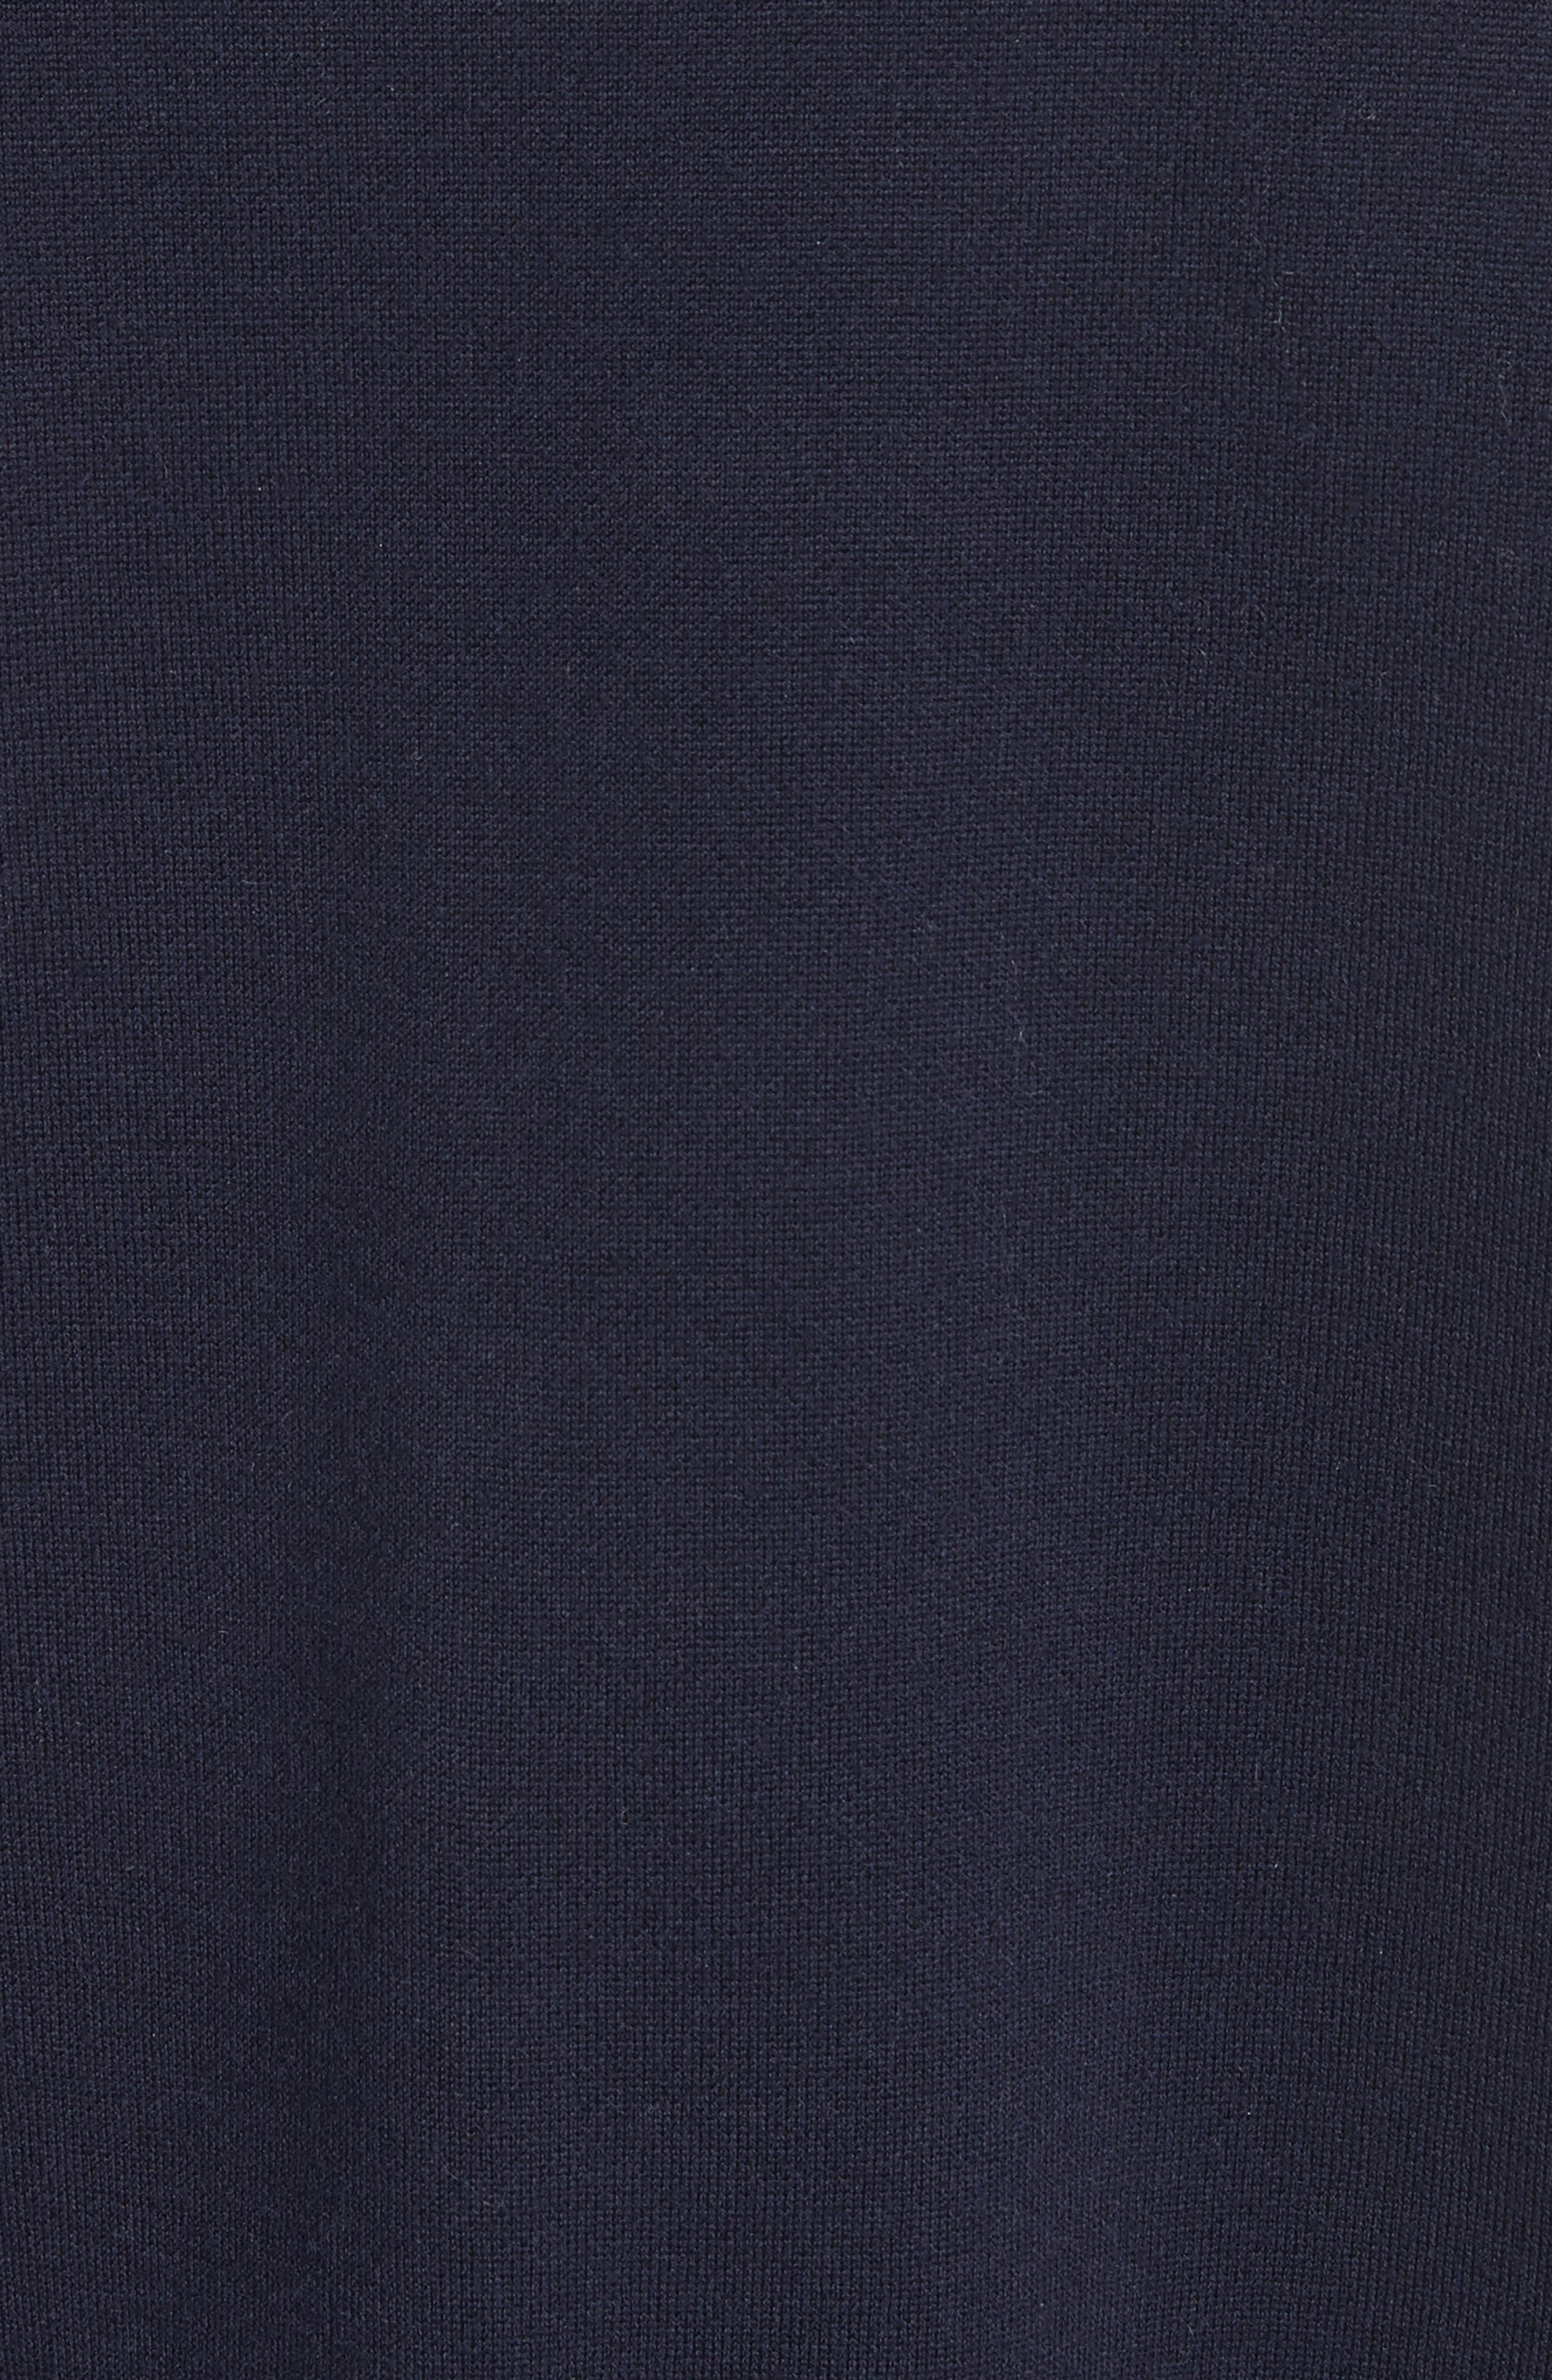 Imitation Pearl Sleeve Merino Wool Sweater,                             Alternate thumbnail 6, color,                             Navy/ Black